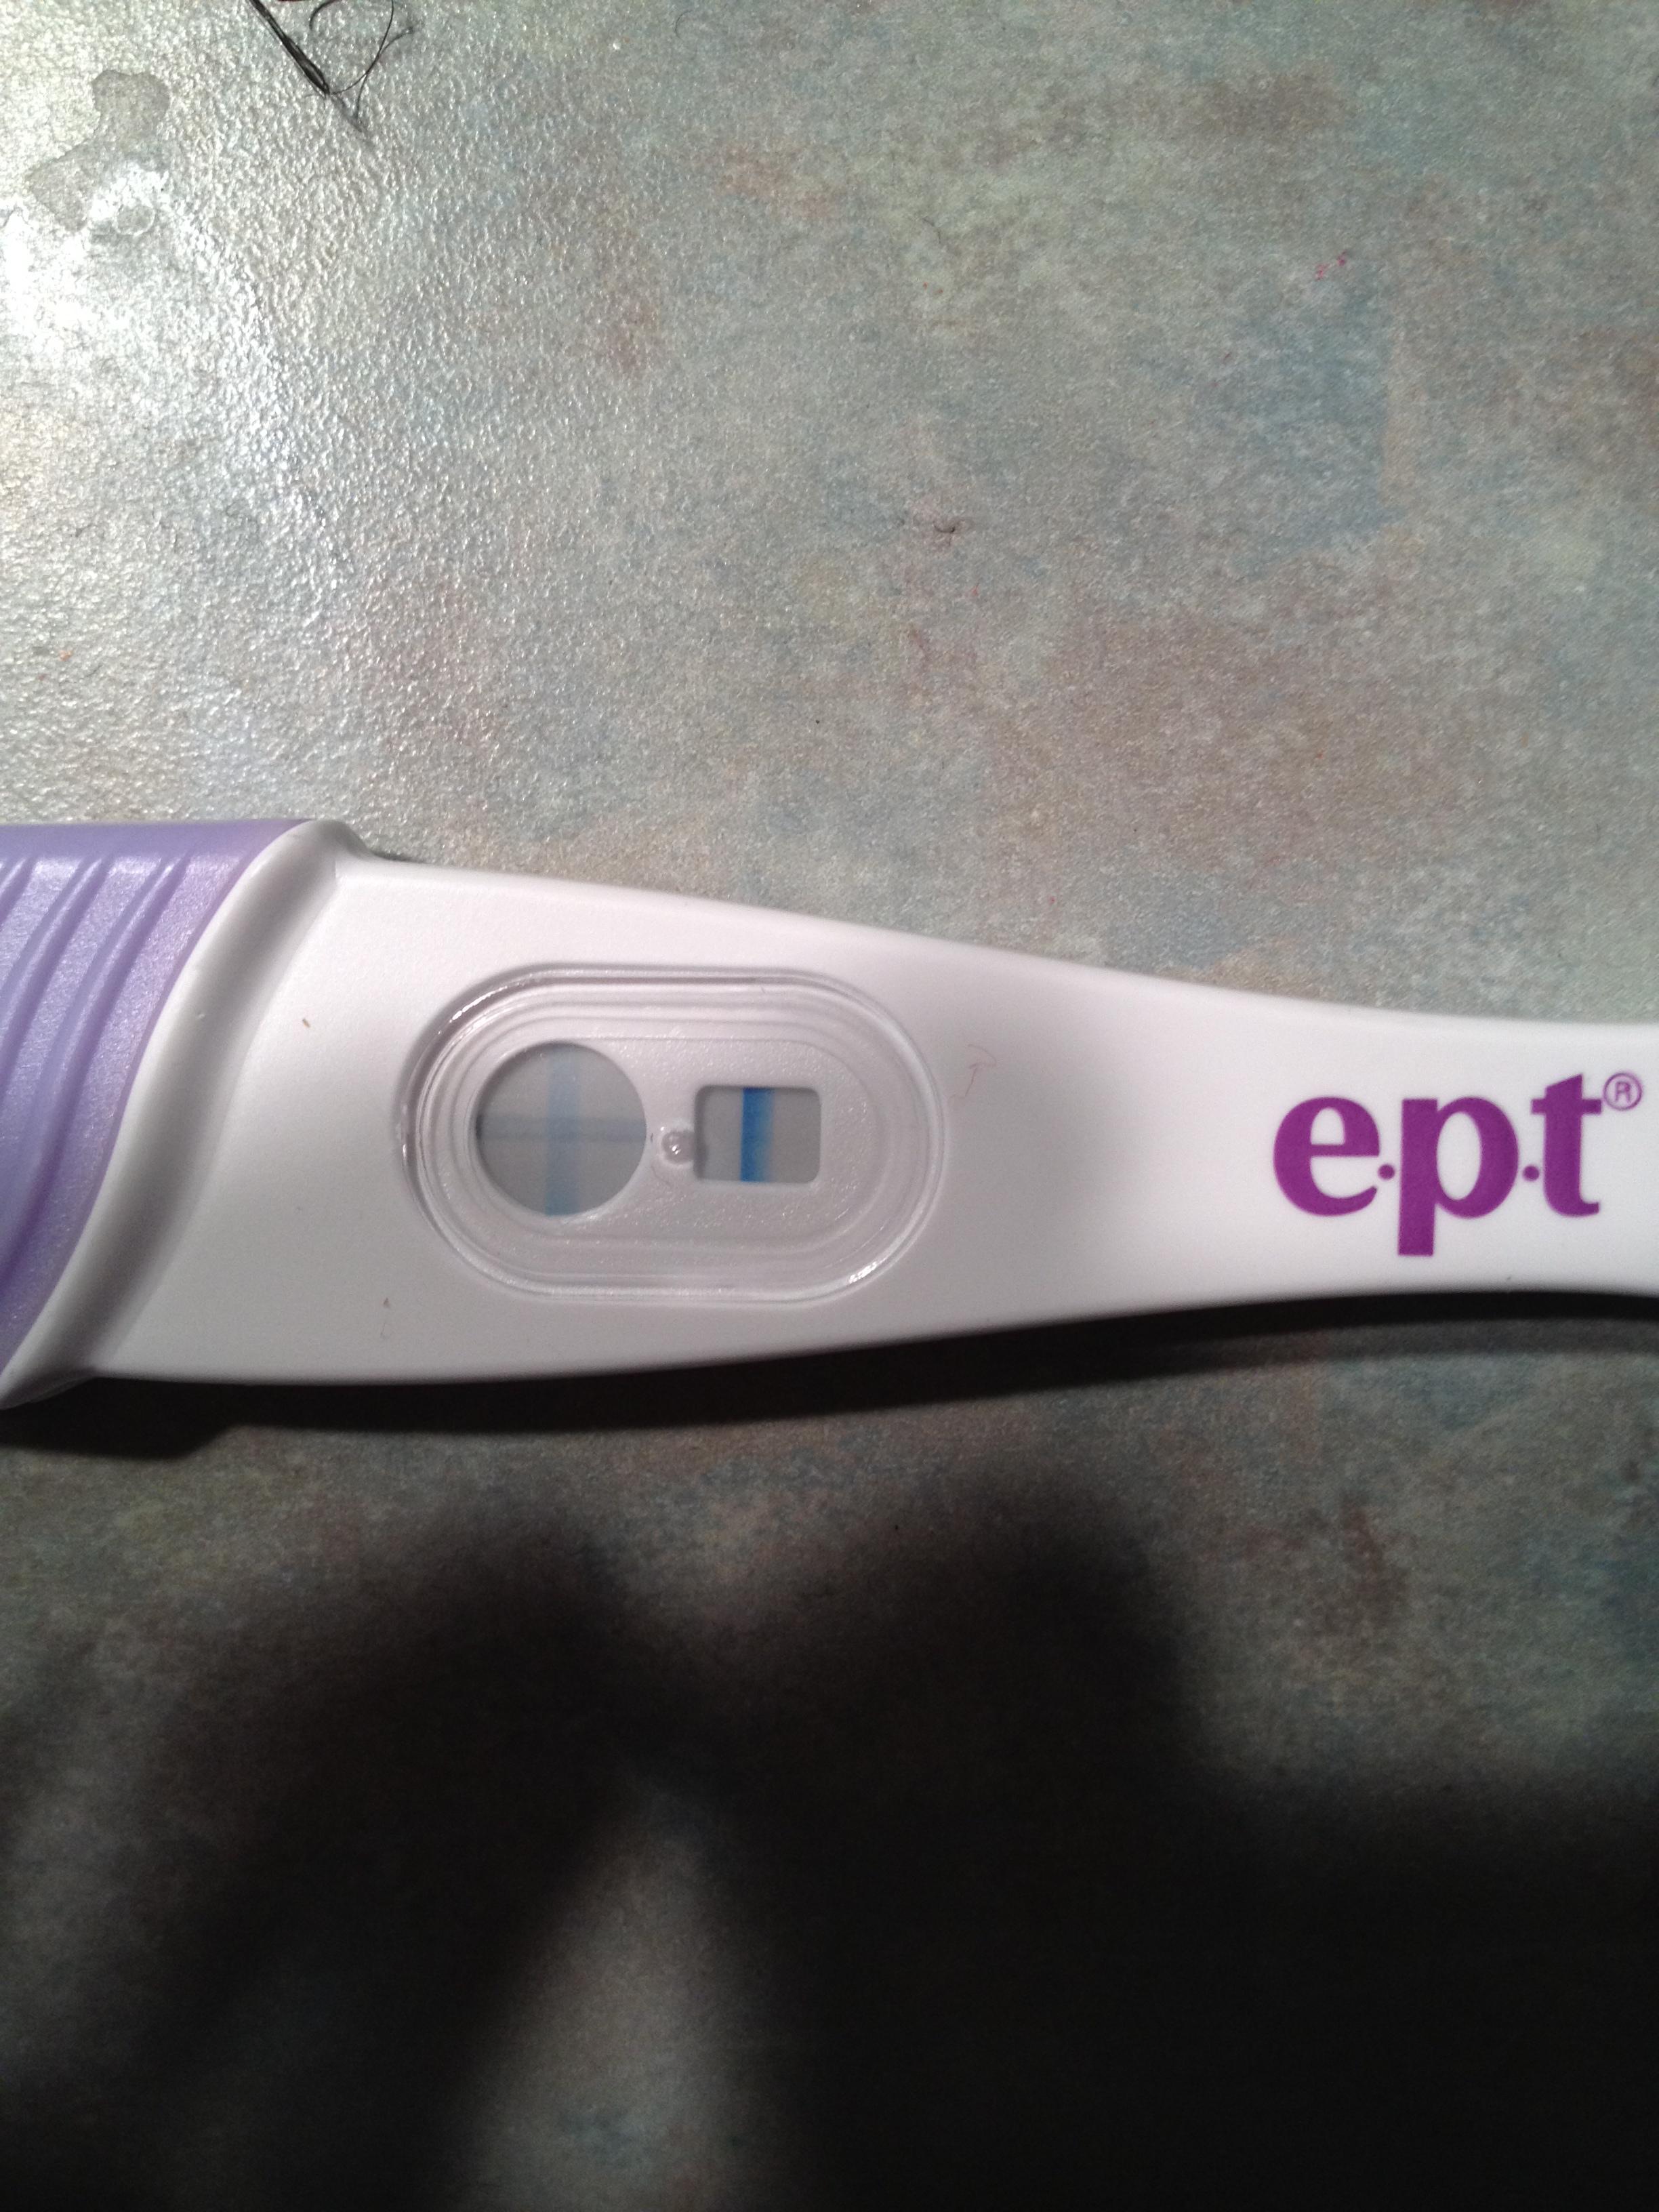 Faint Positive Ept Pregnancy Test - 2187.7KB